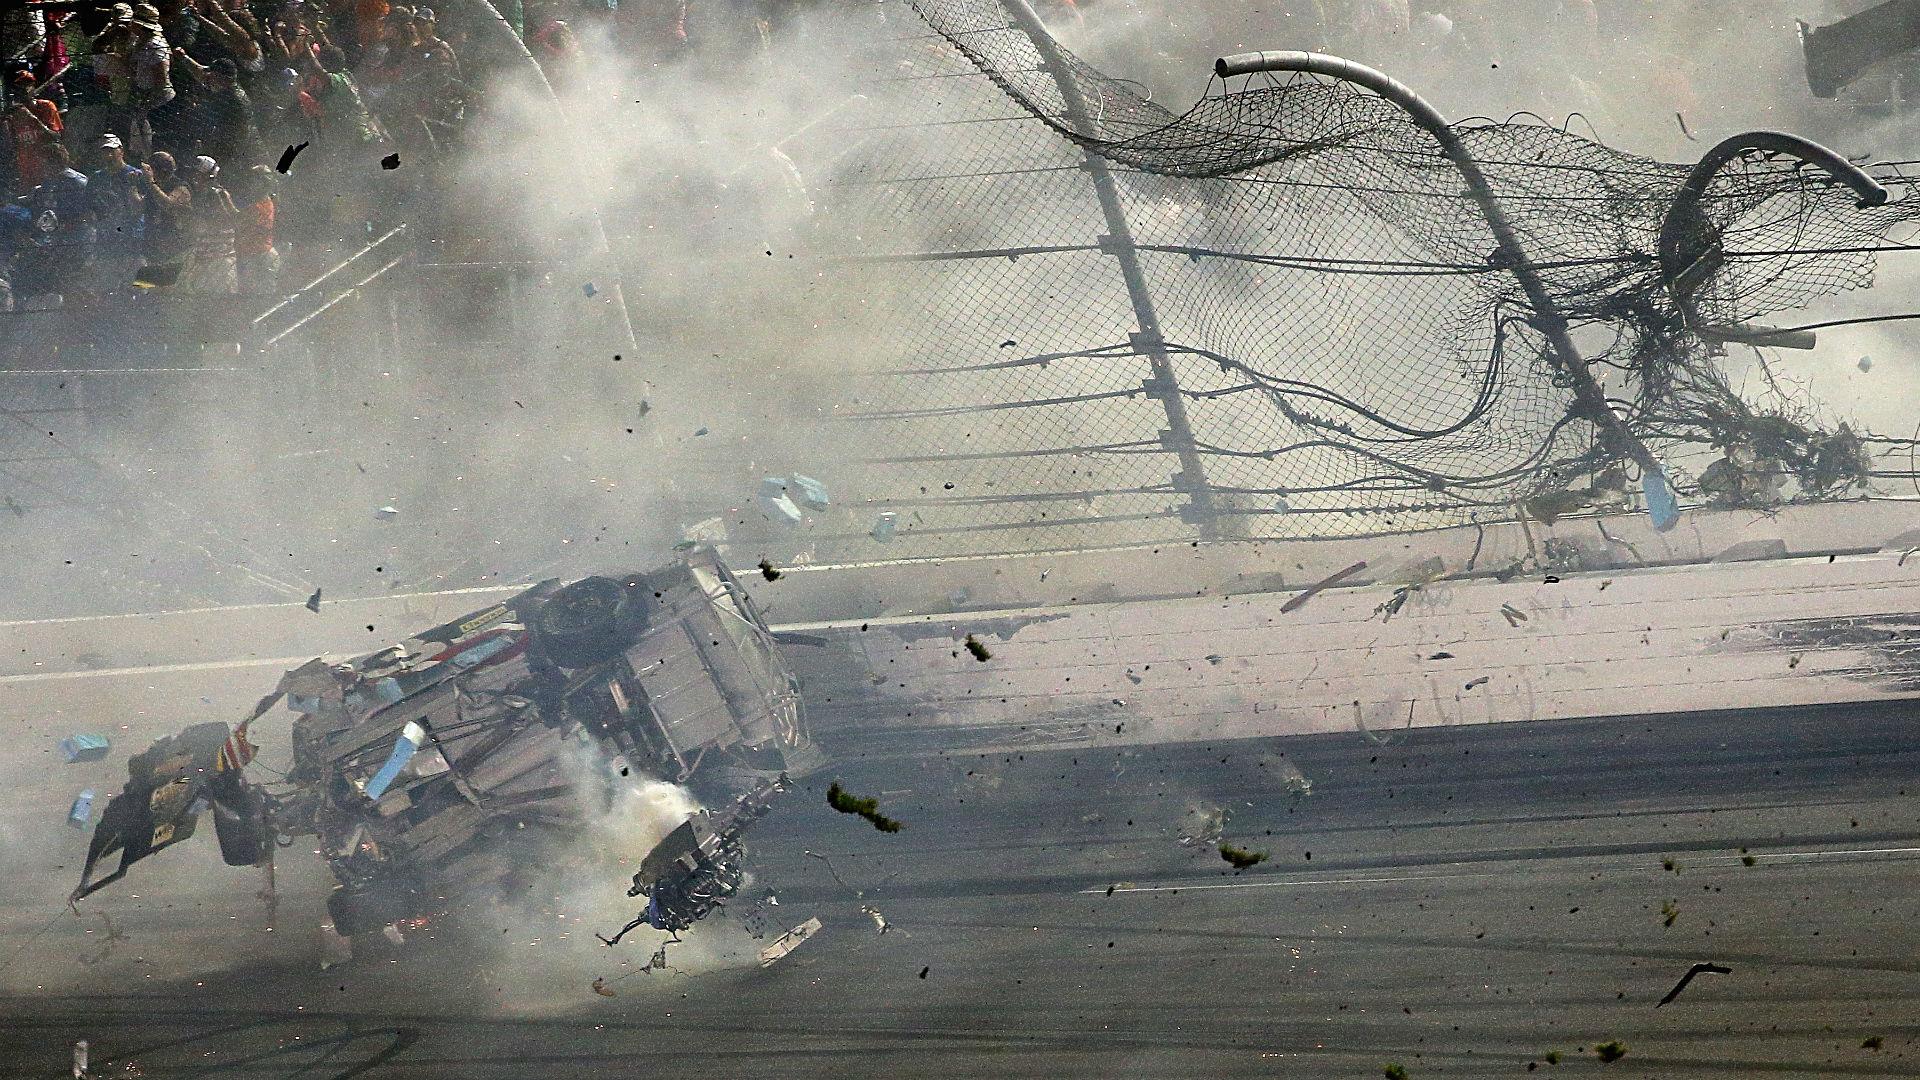 Drivers, media implore NASCAR to act after horrific Daytona crash